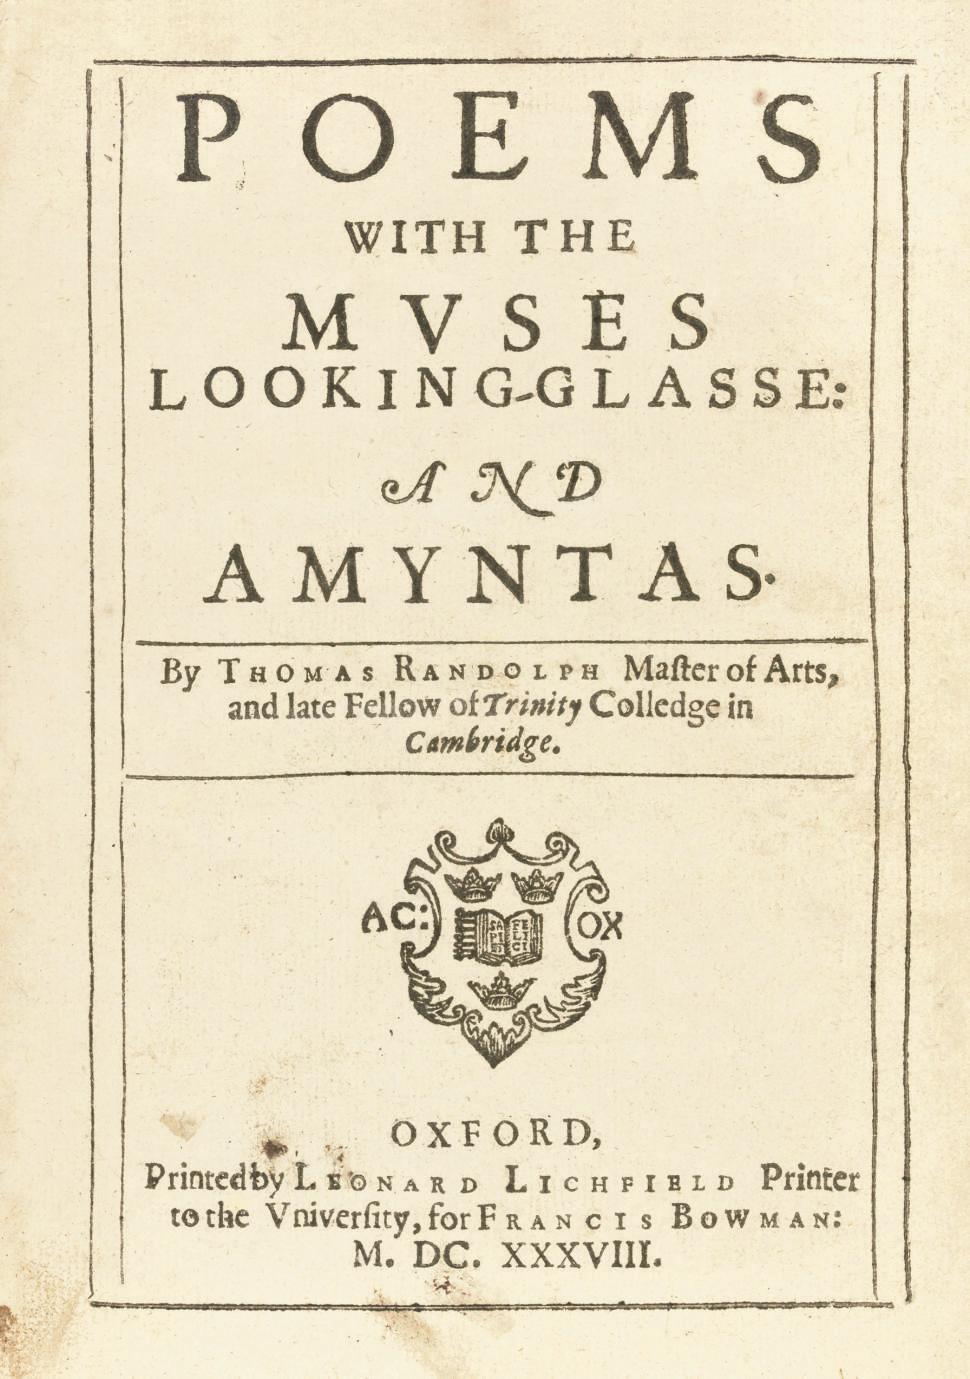 RANDOLPH, Thomas (1605-1635).